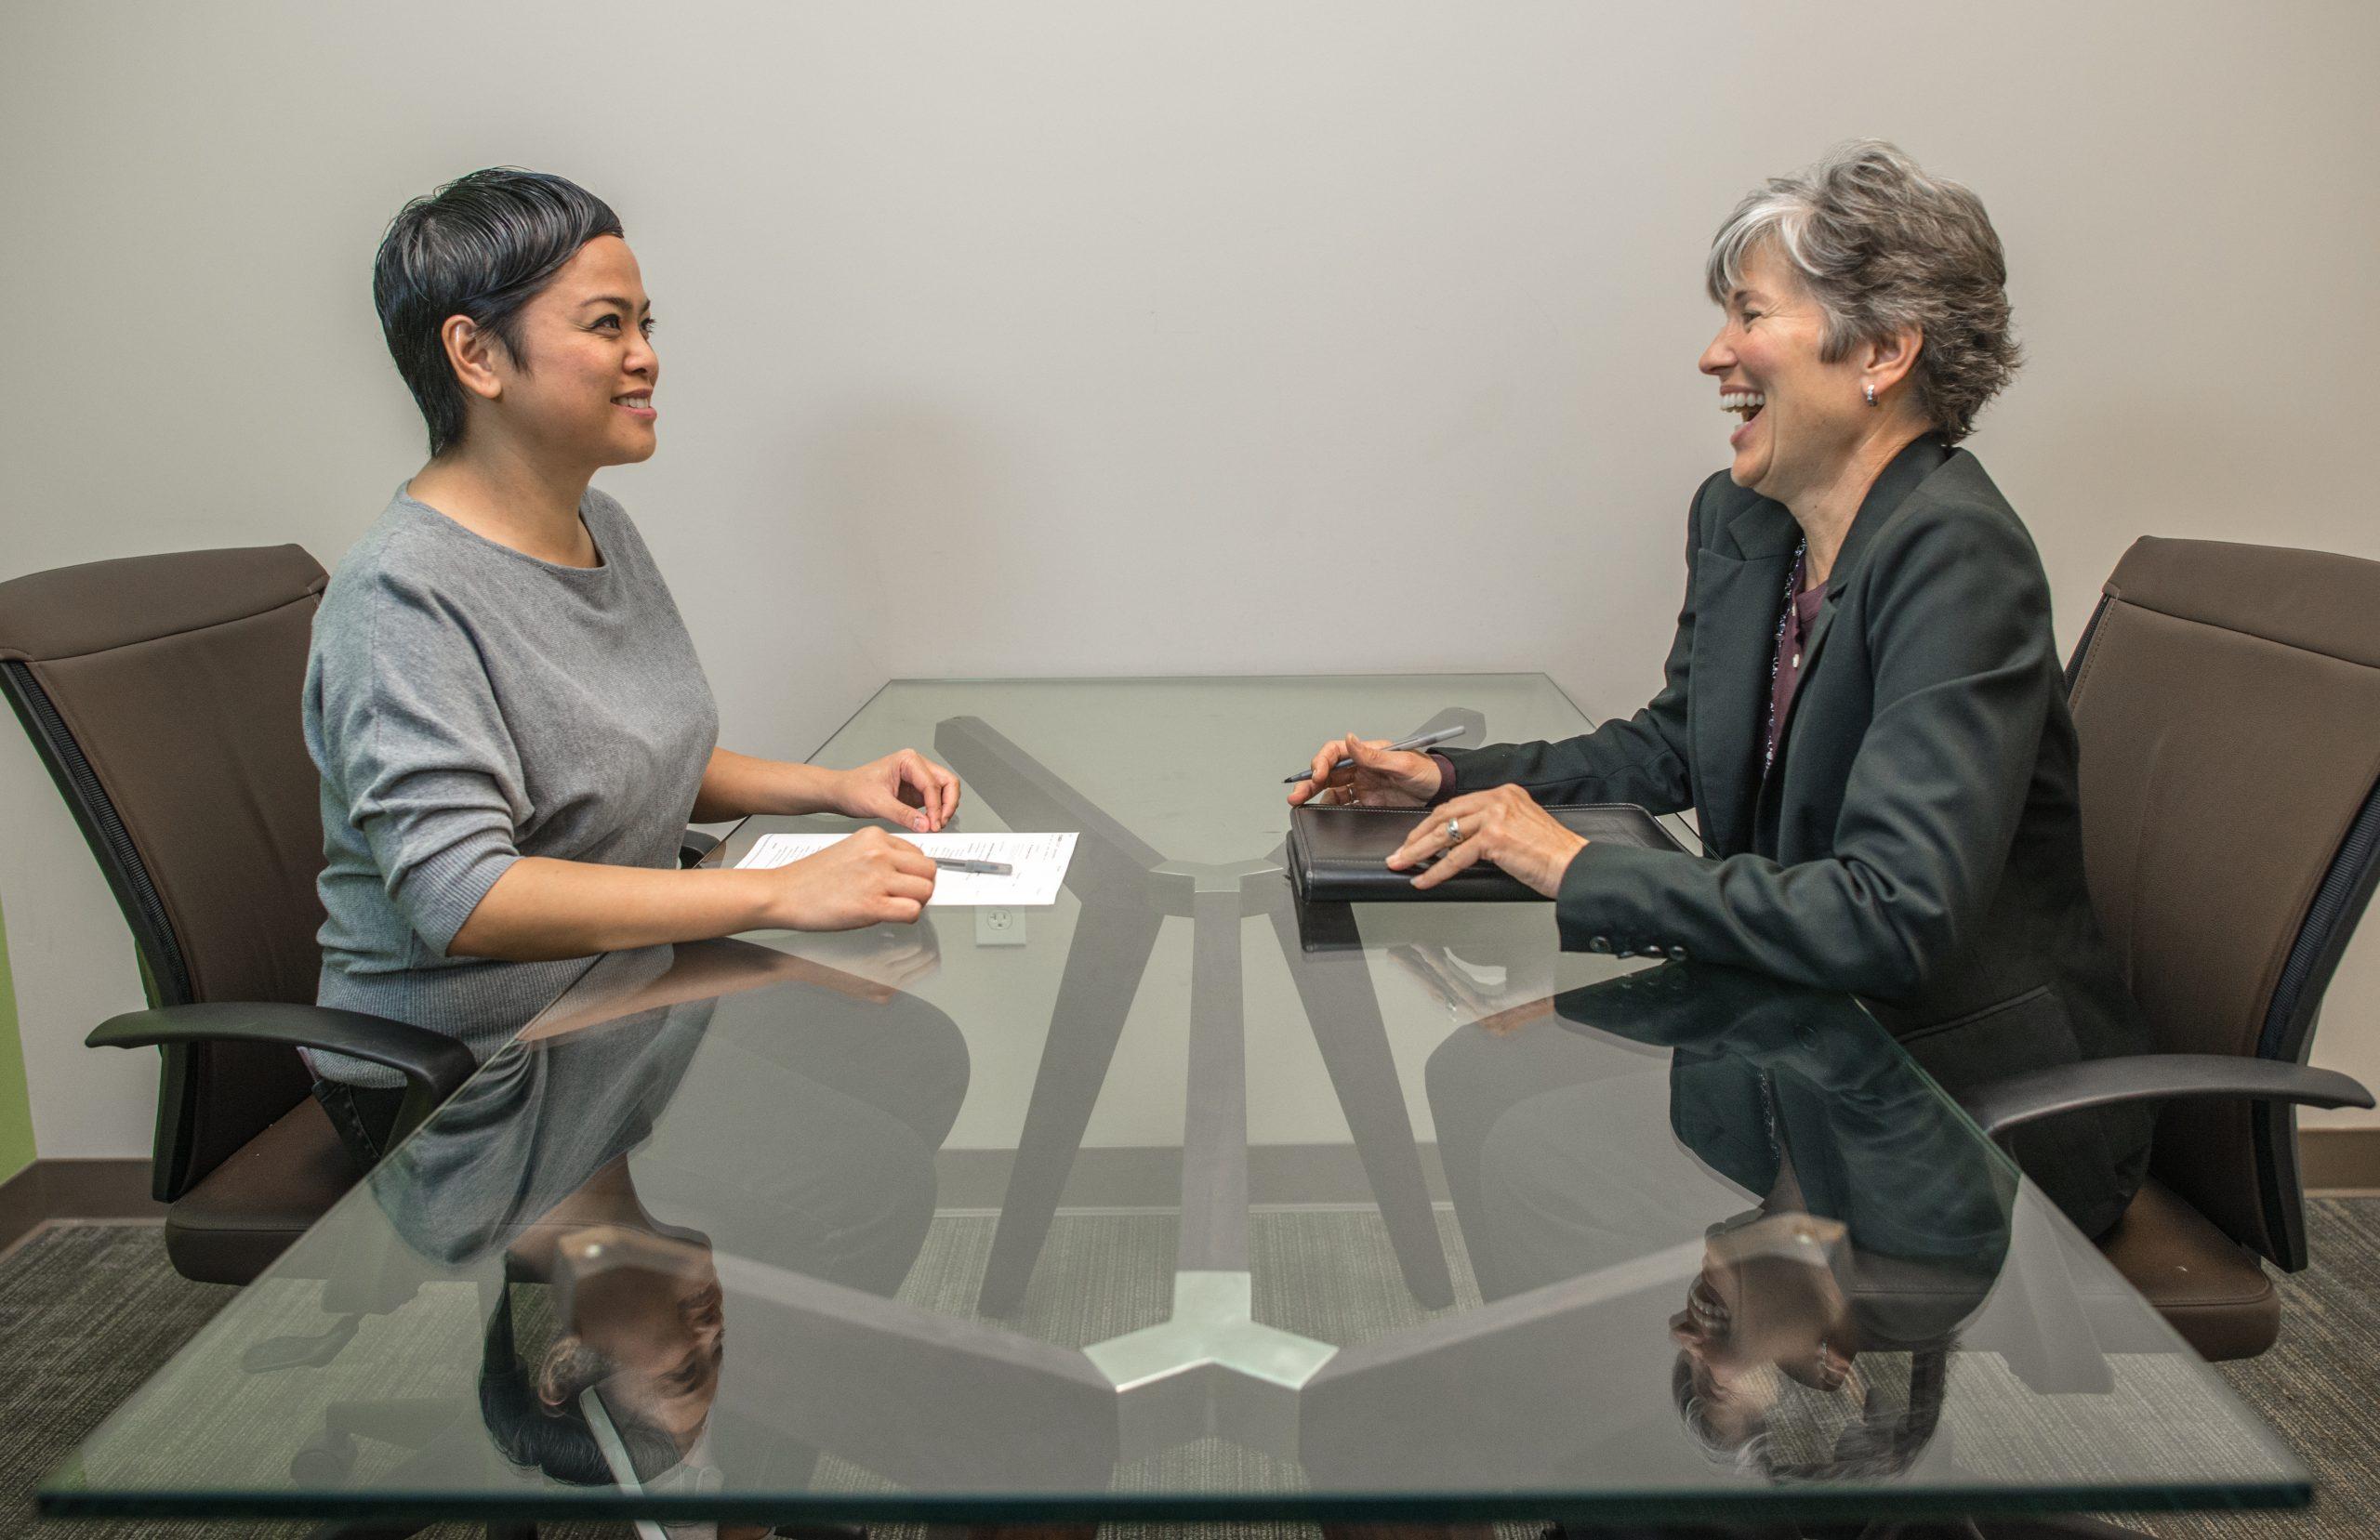 Interview process. Photo by: Stefanie Cassidy. Credits to: www.amtec.us.com